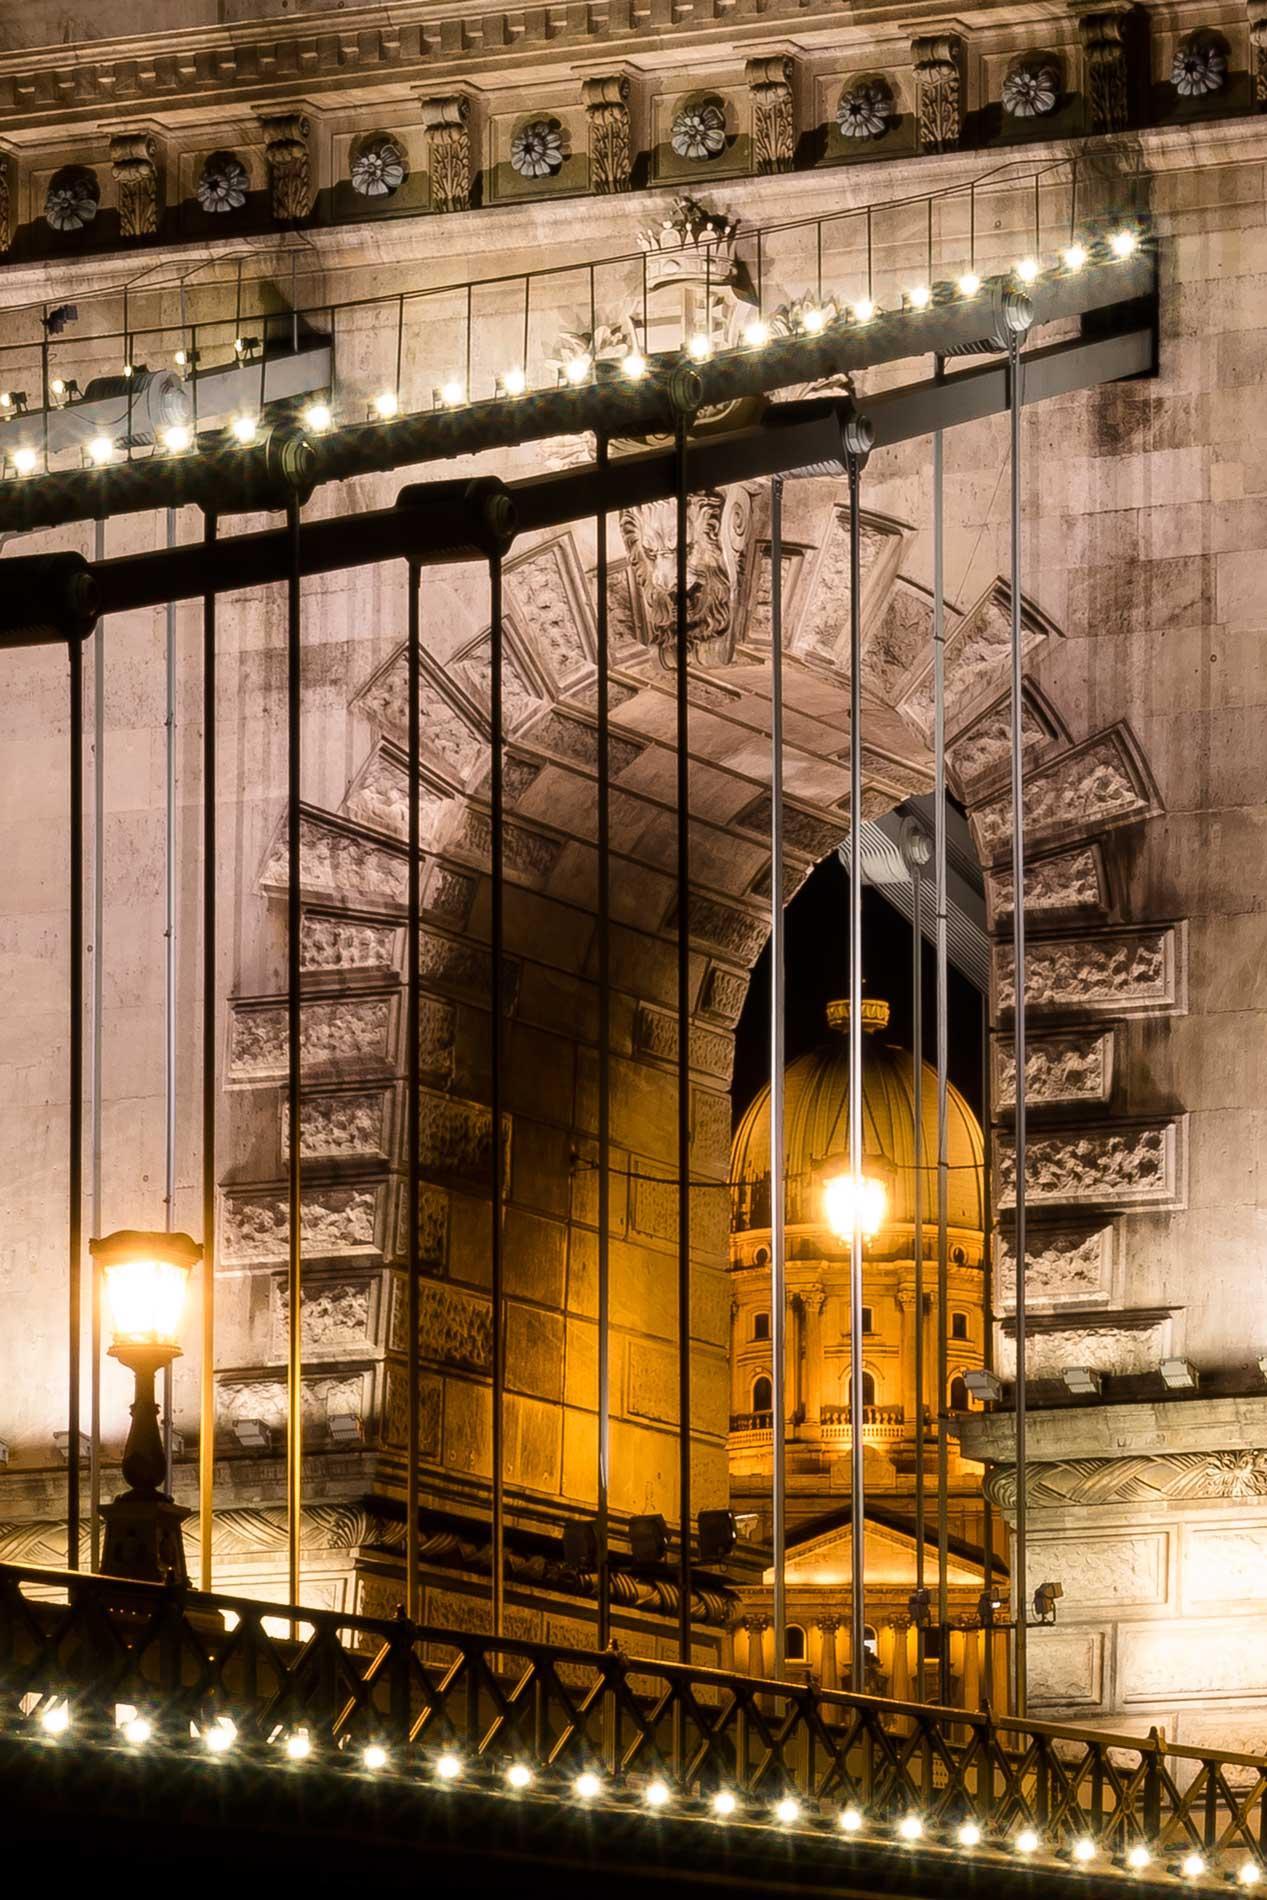 budapest_atthary_photography_bridge_36